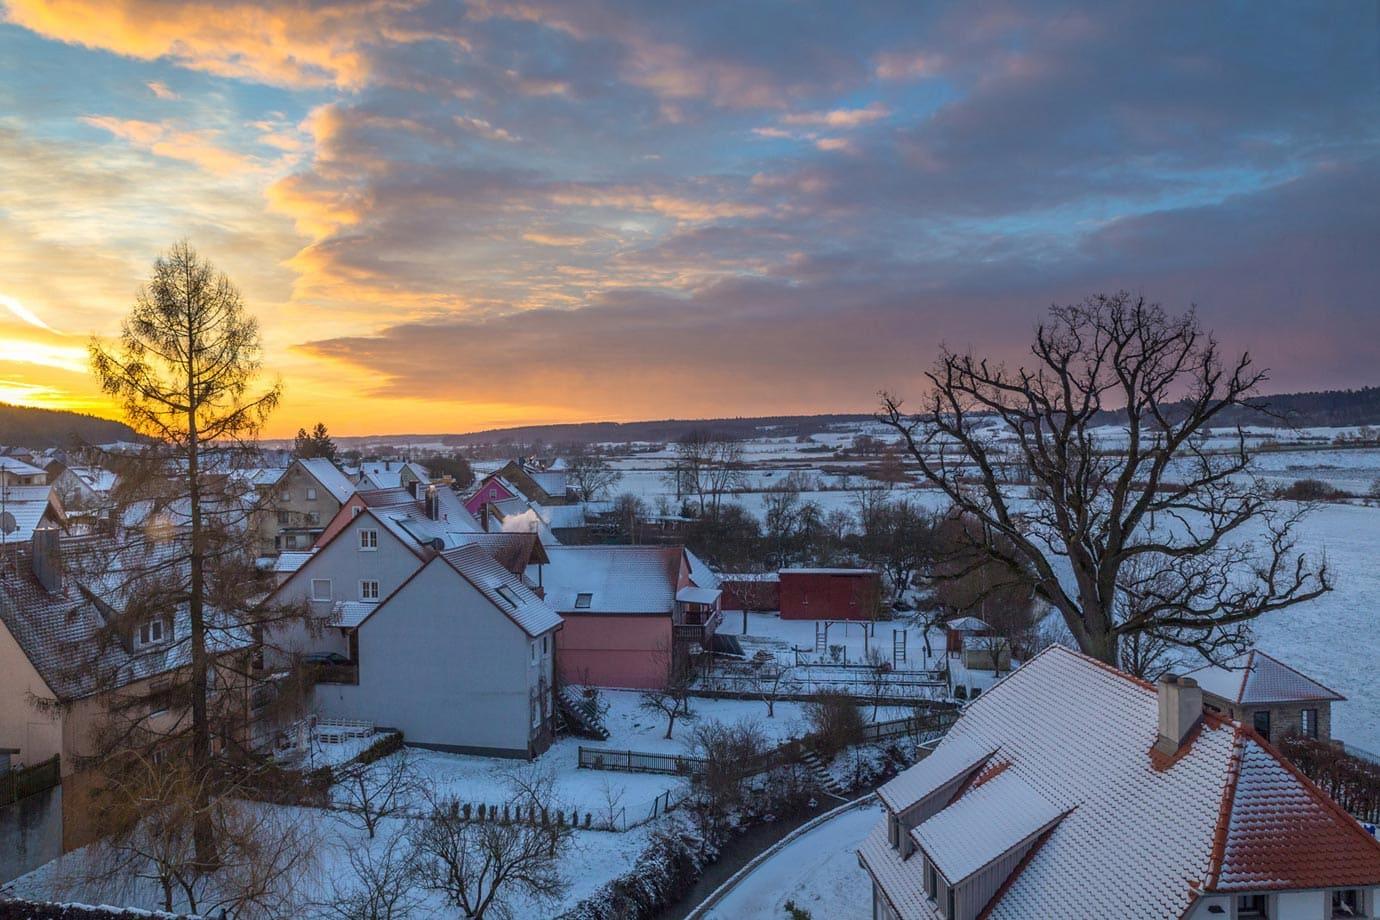 Lehrberg, Germany